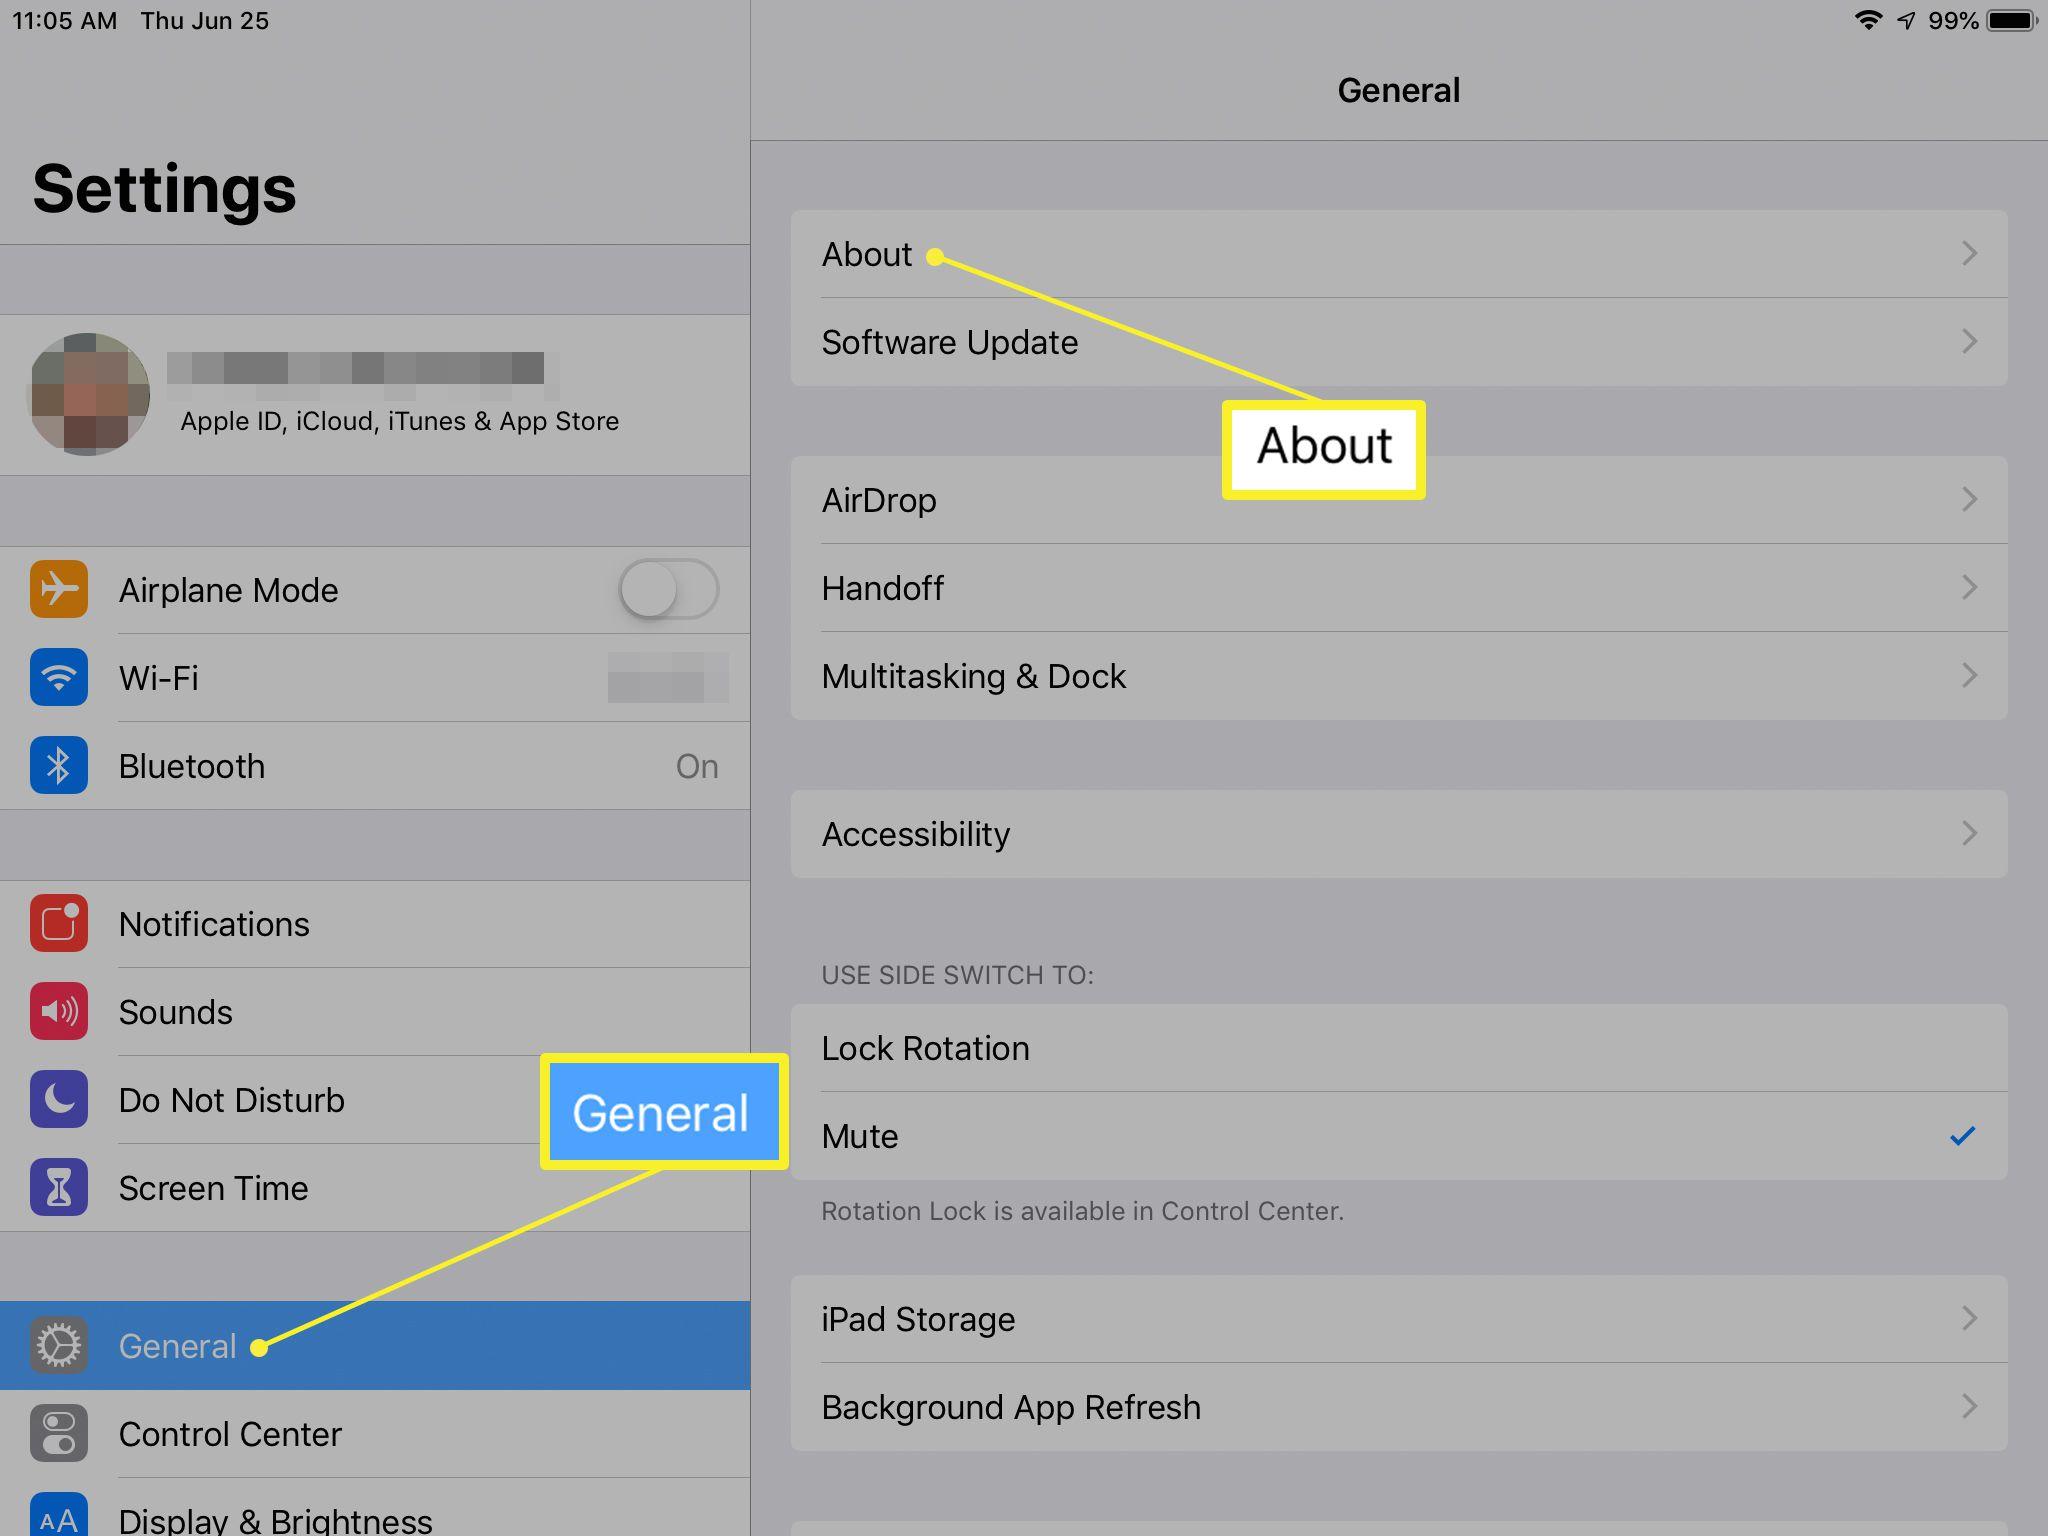 General settings screen on iPad